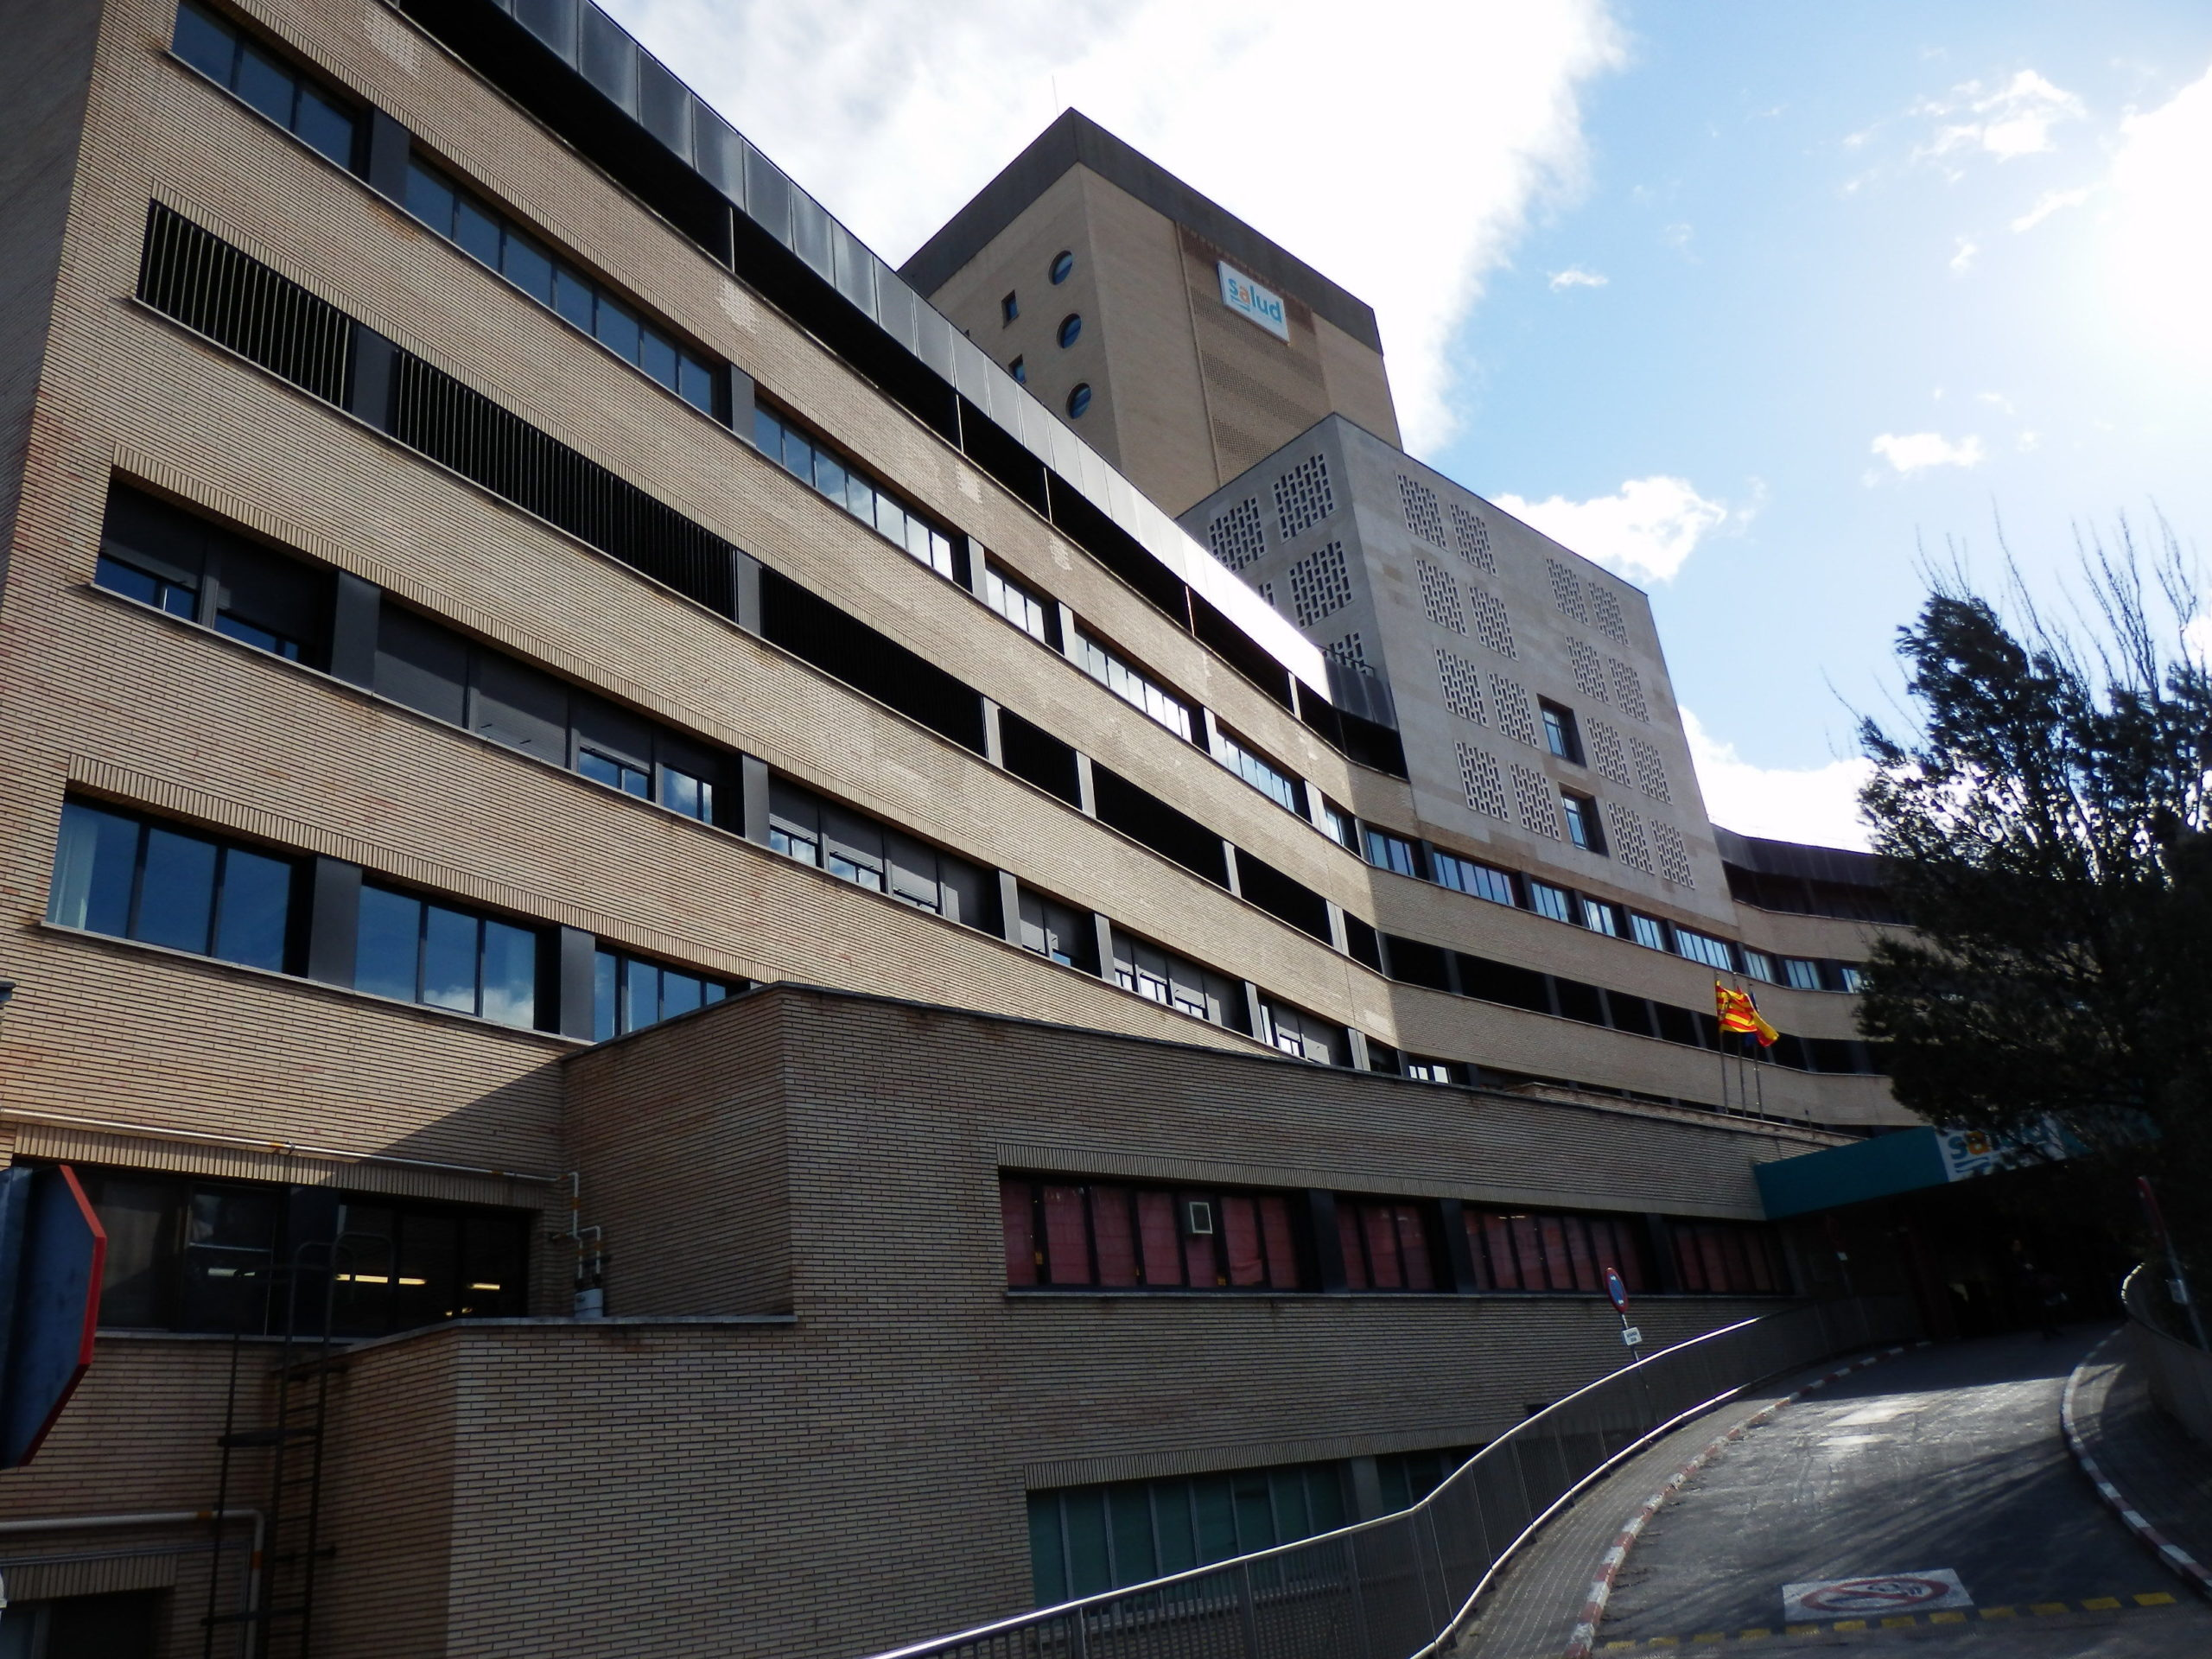 Hospital Clínico Universitario de Zaragoza